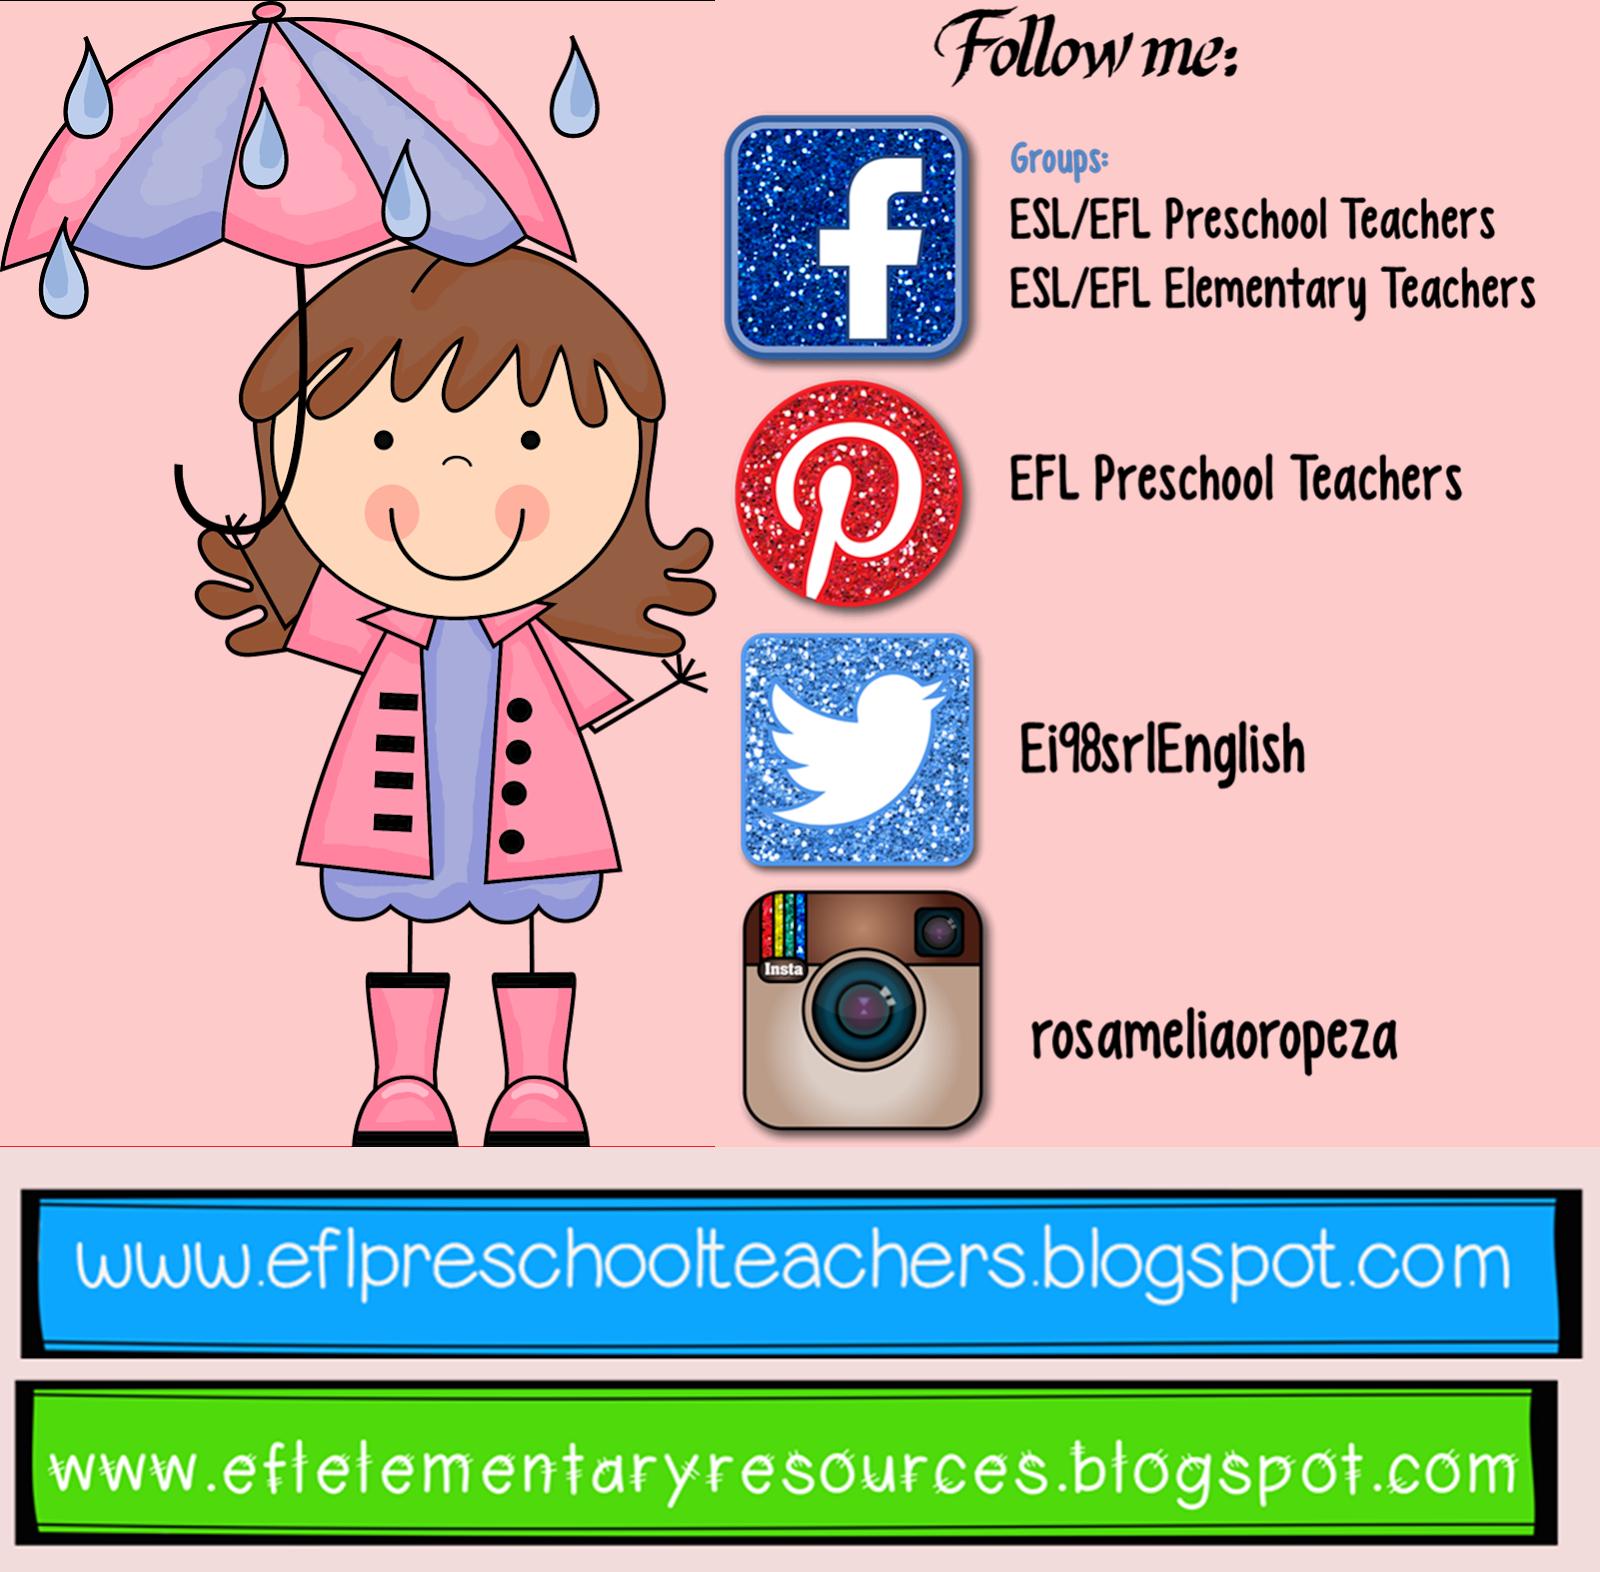 Kindergarten clipart morning meeting. A blog dedicated to